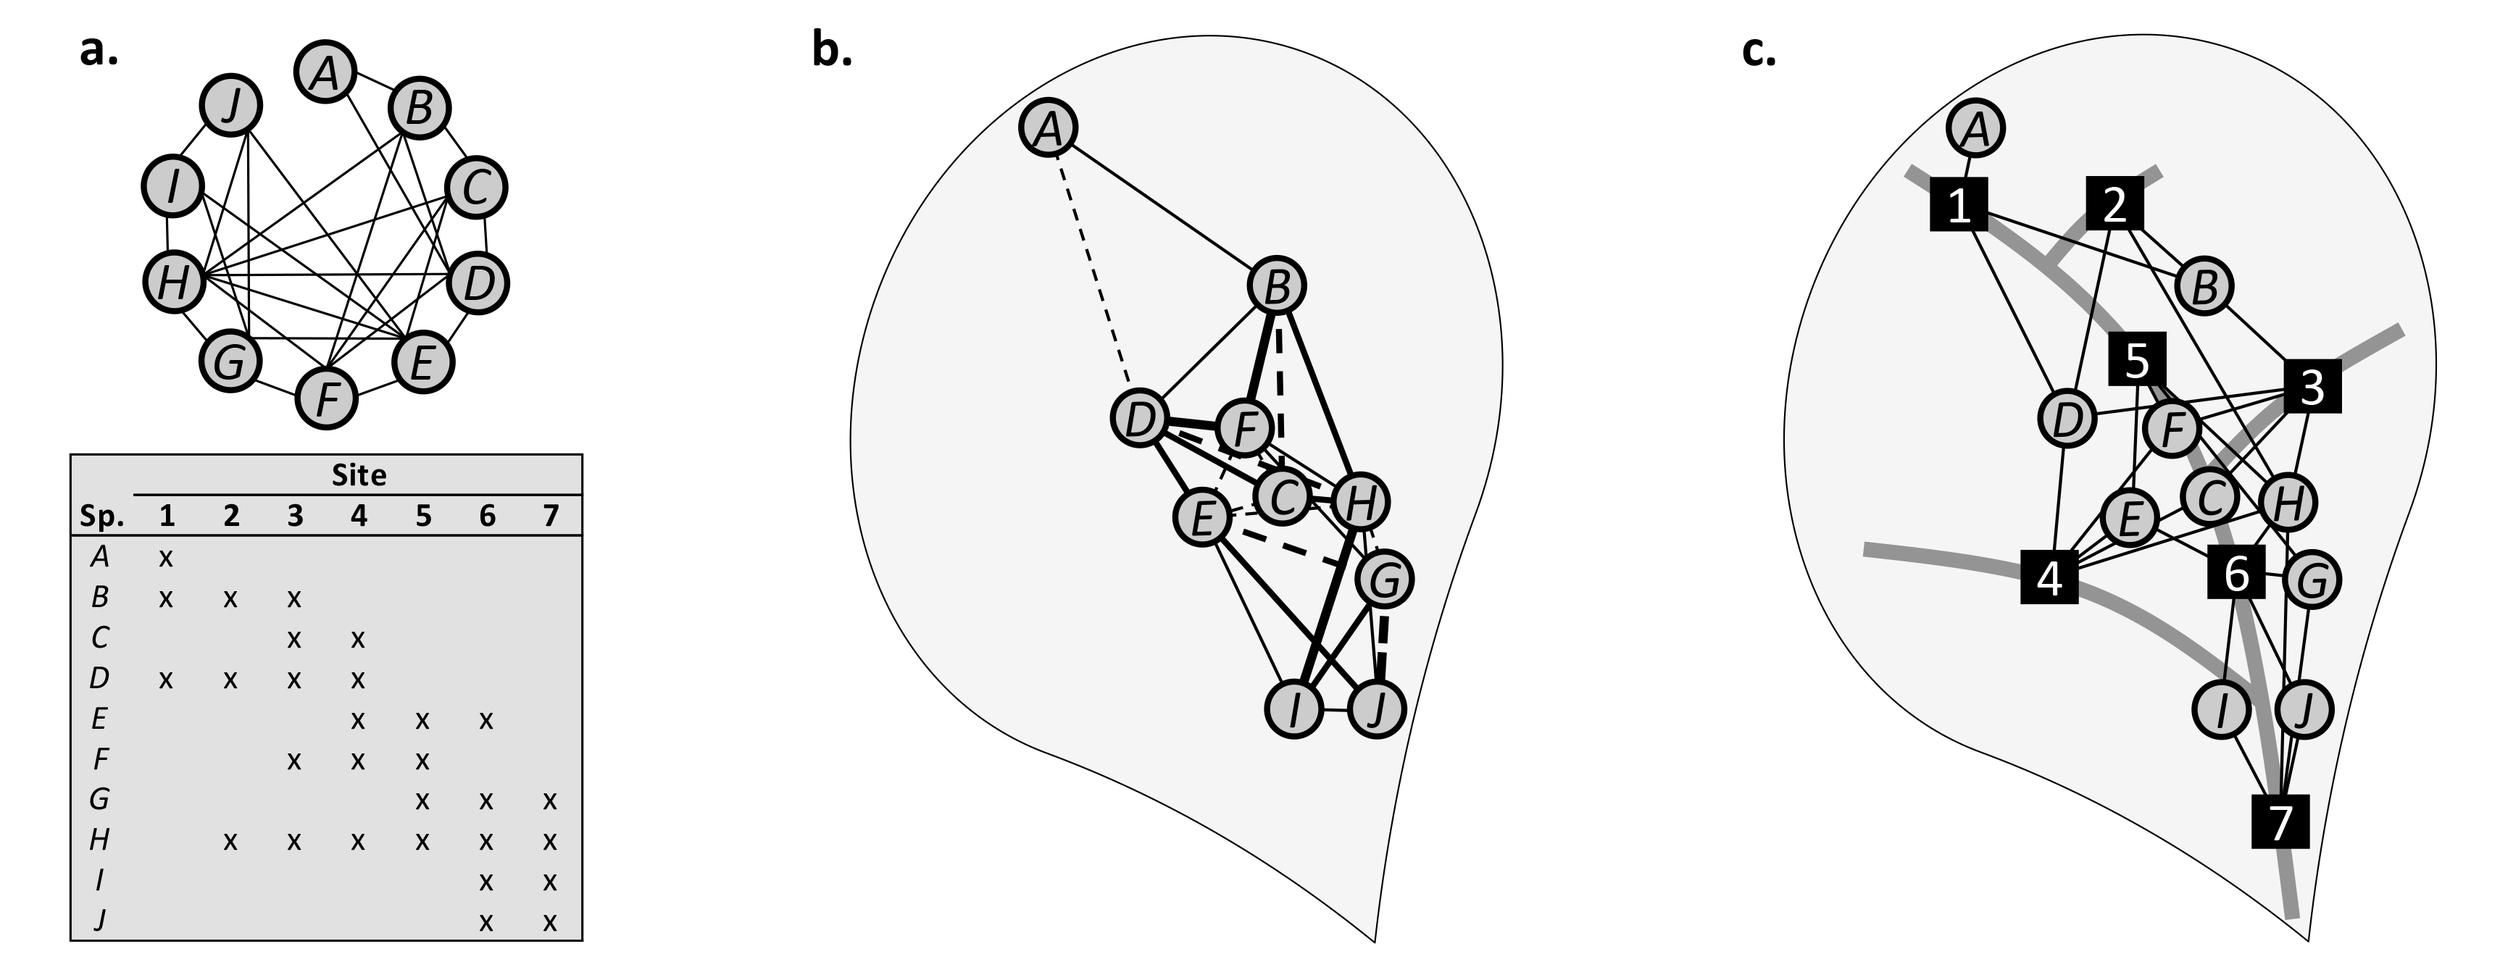 Network_Diagram.png